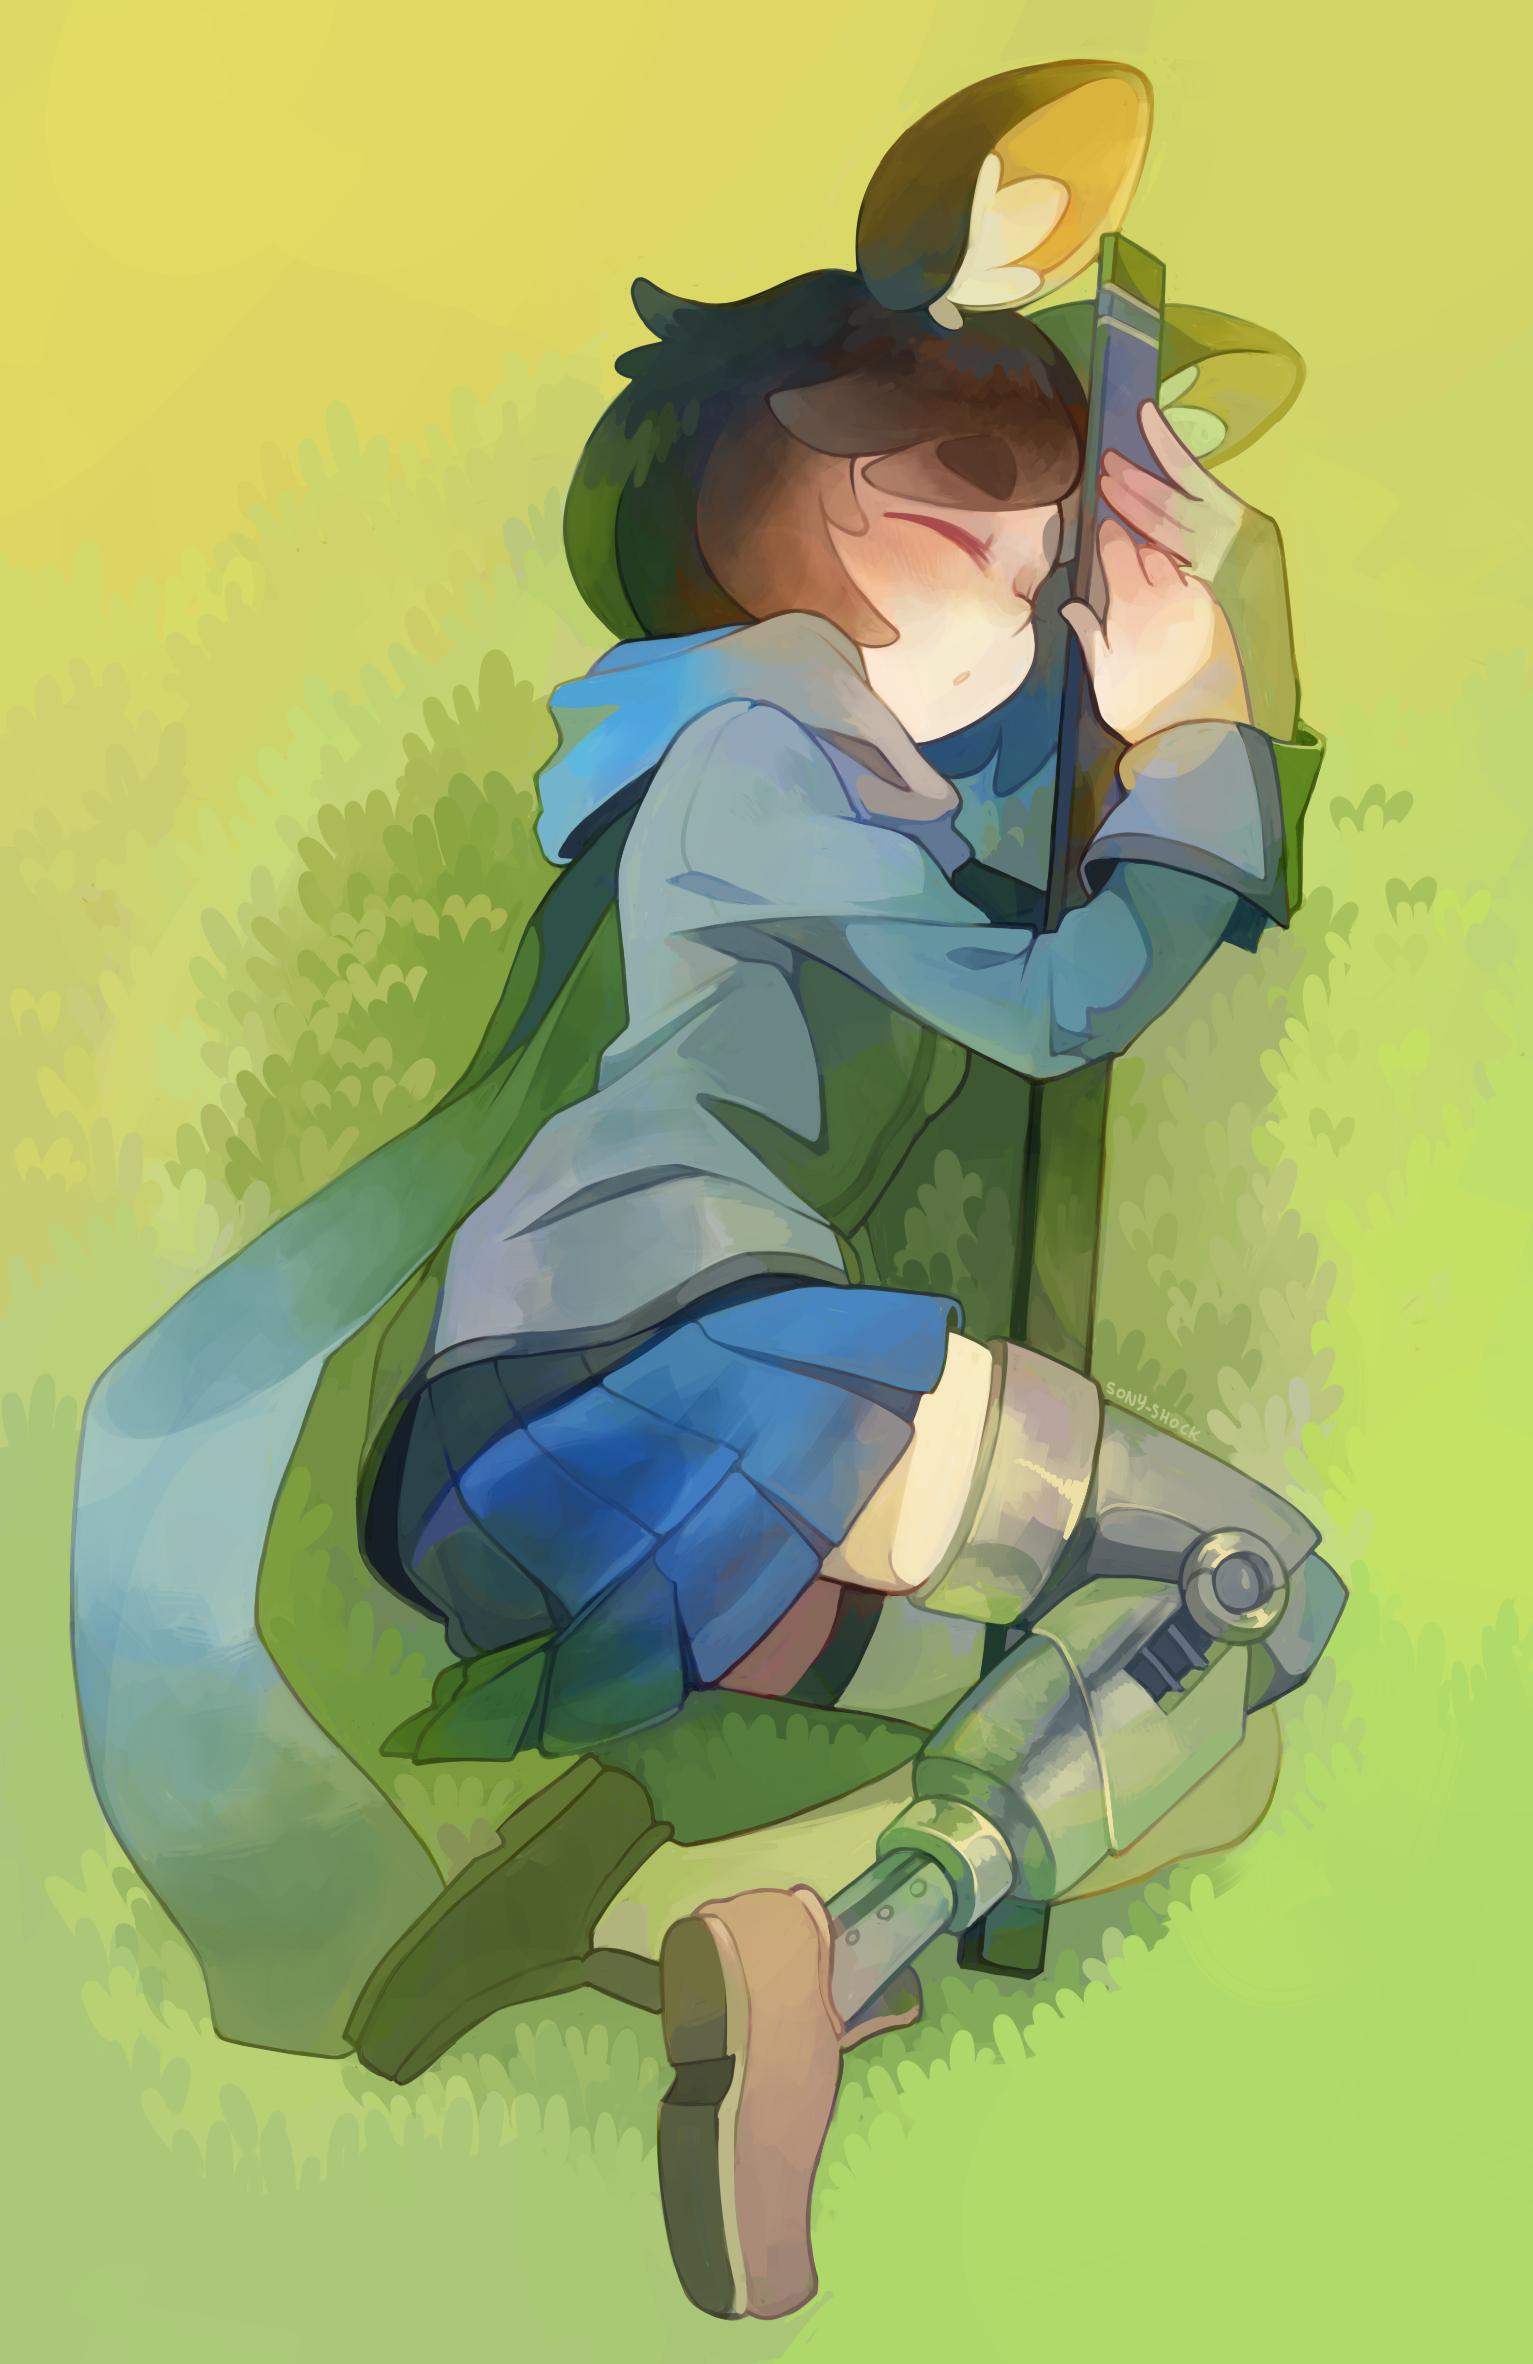 COMM- Rest